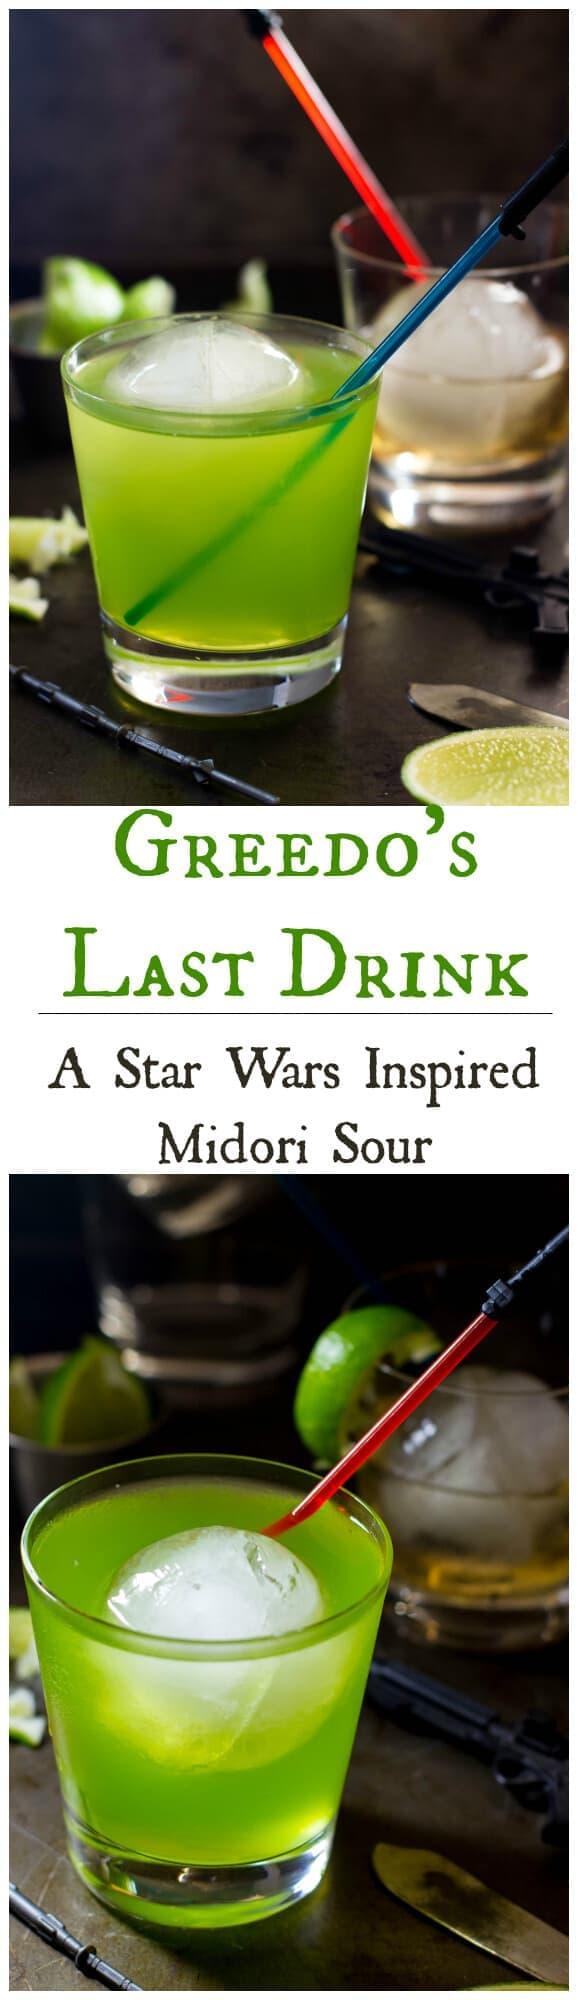 greedos last drink a star wars tribute sugar spun run